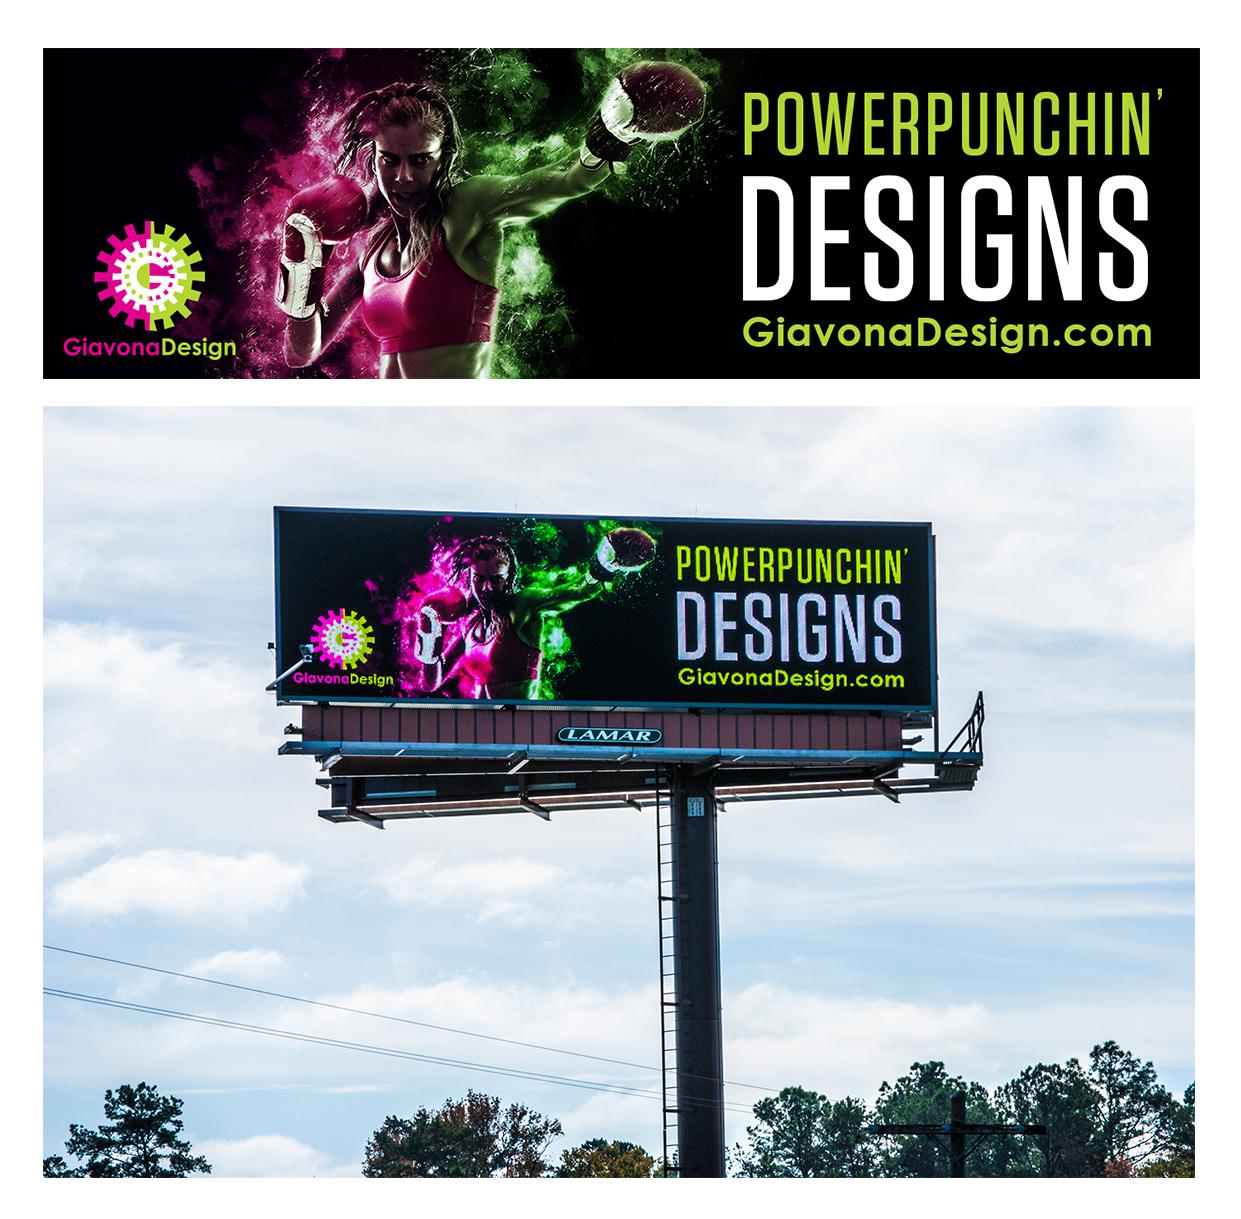 Self-Promo piece for GiavonaDesign, LLC  Submission: Motivatin' Design Integrated Campaign